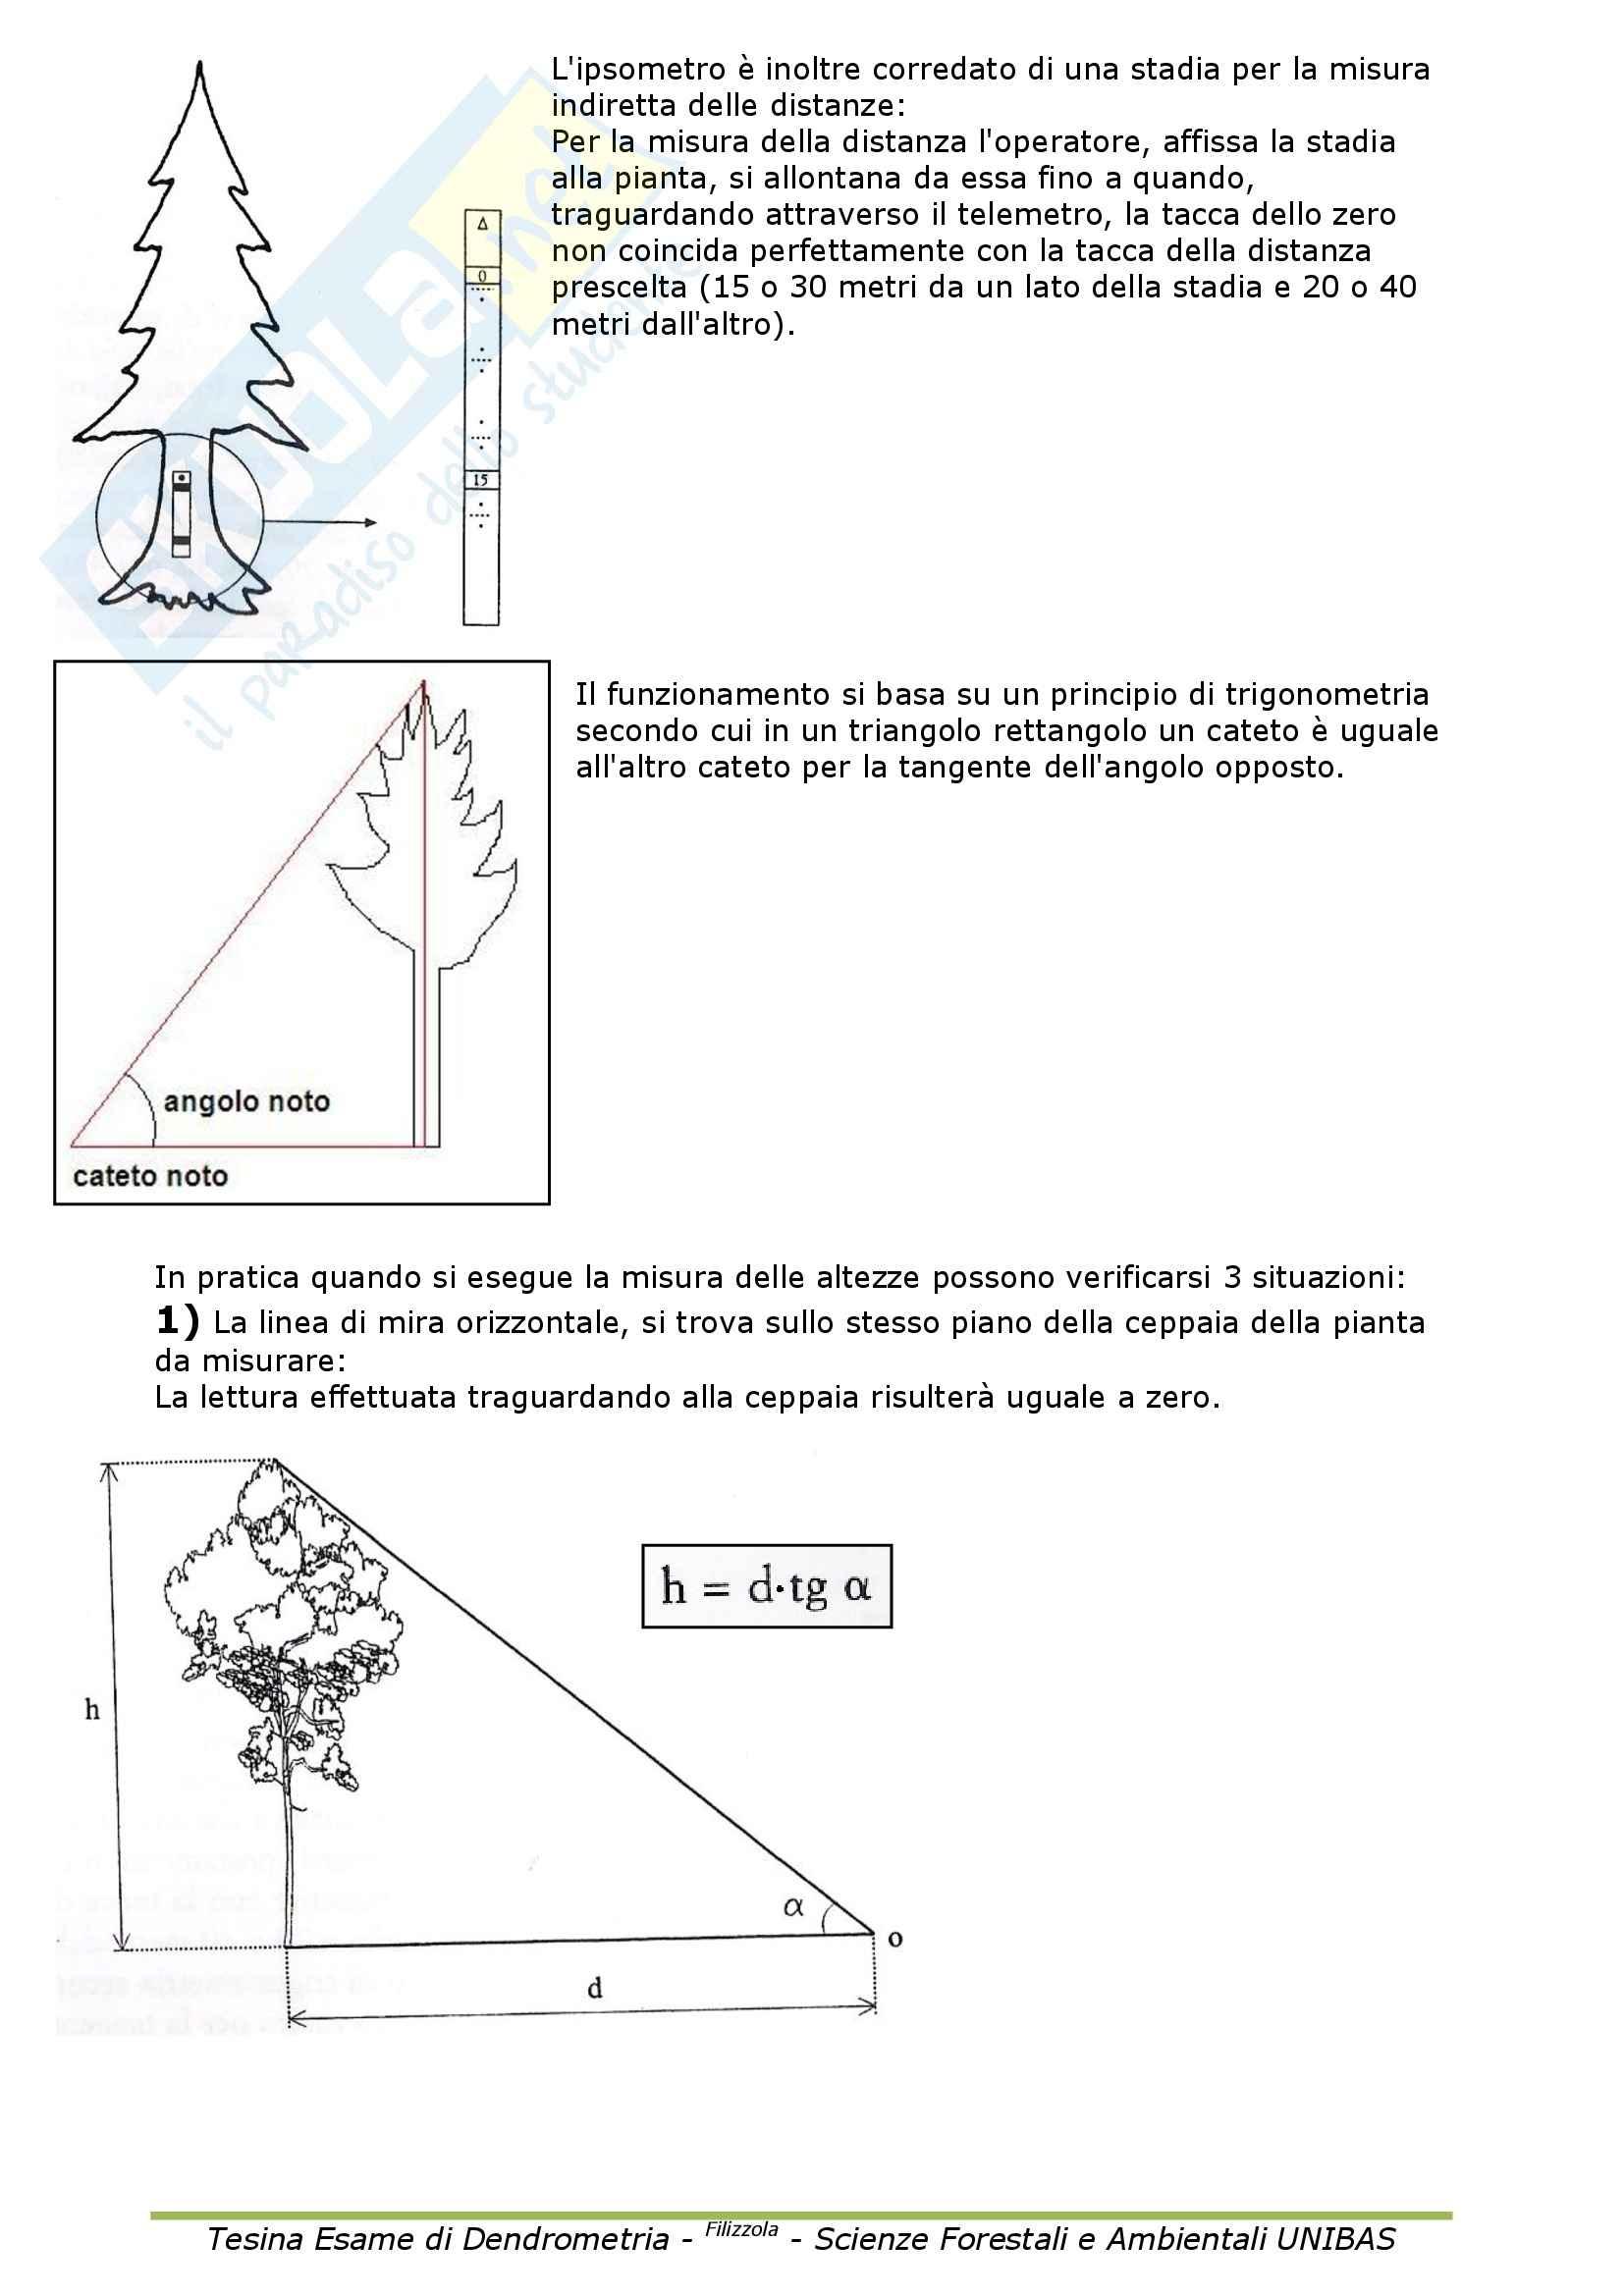 Dendrometria - Appunti Pag. 16